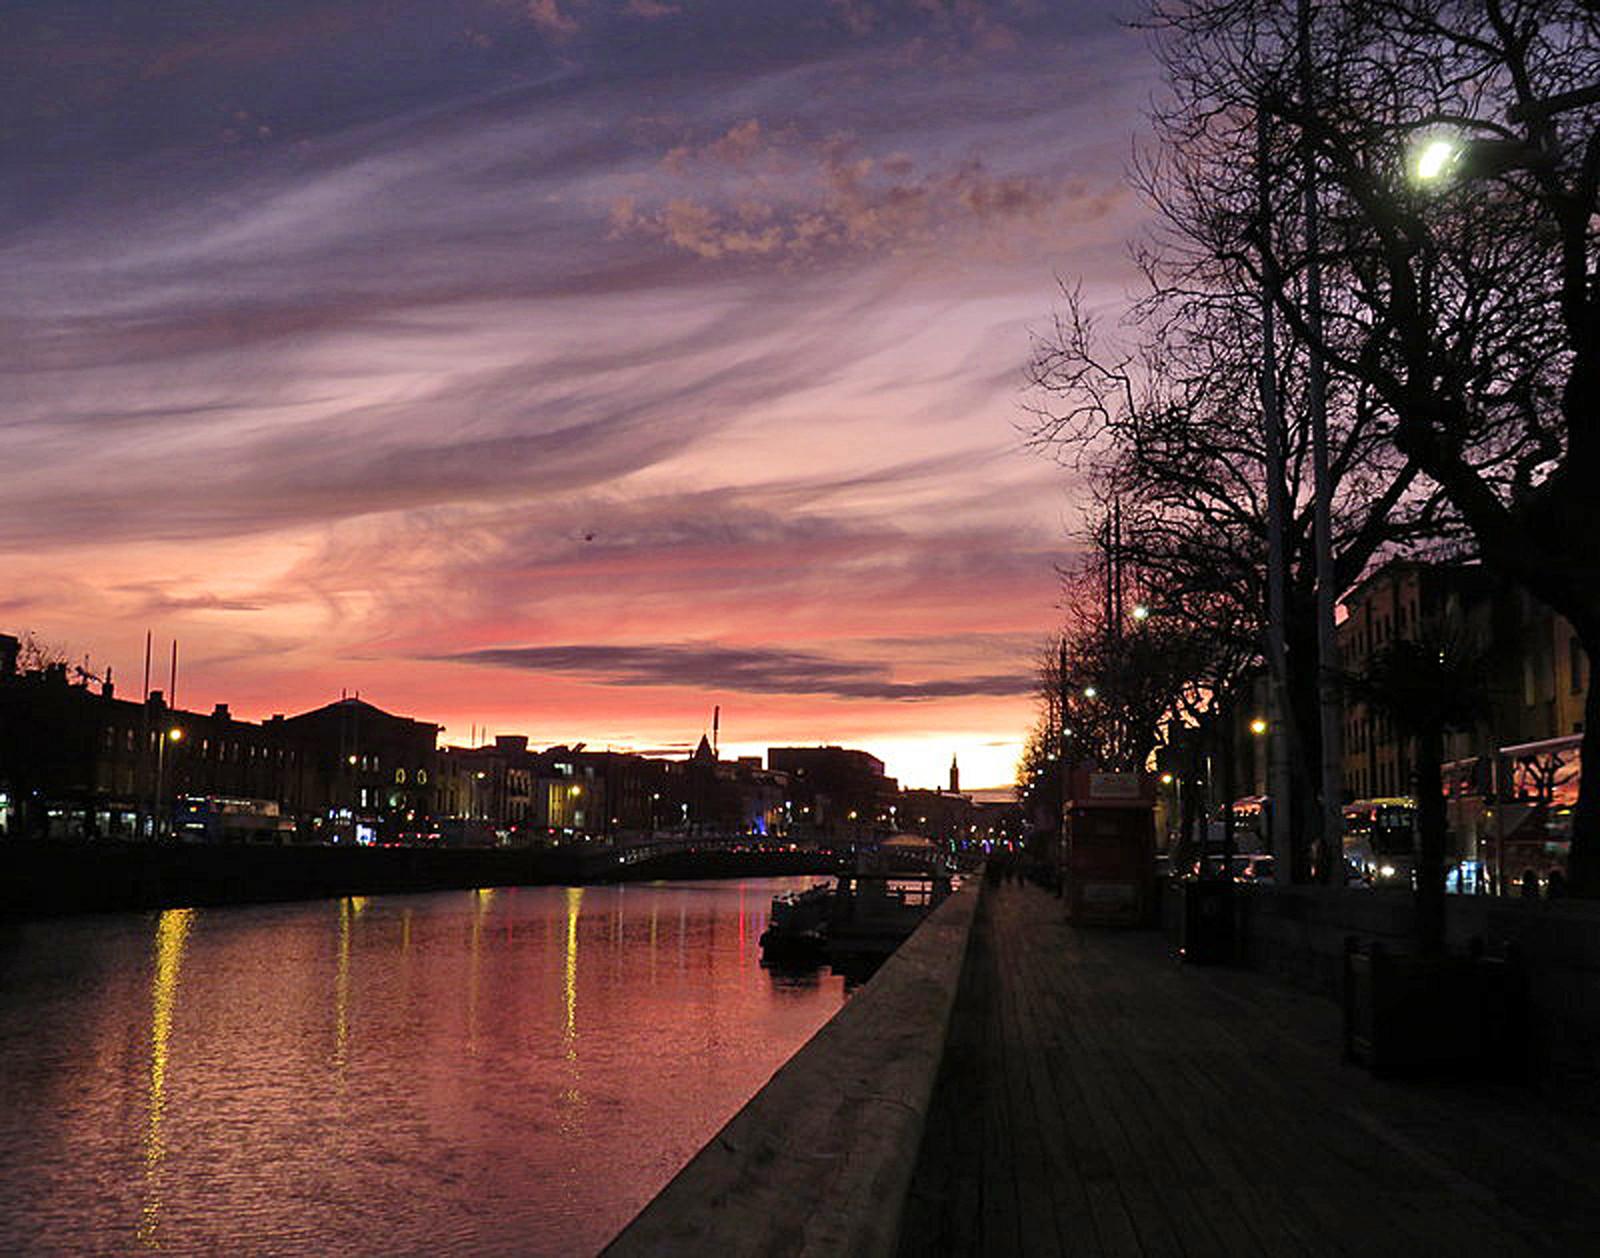 COLOUR - City Winter Sunset by Hilary Kingham (7 marks)